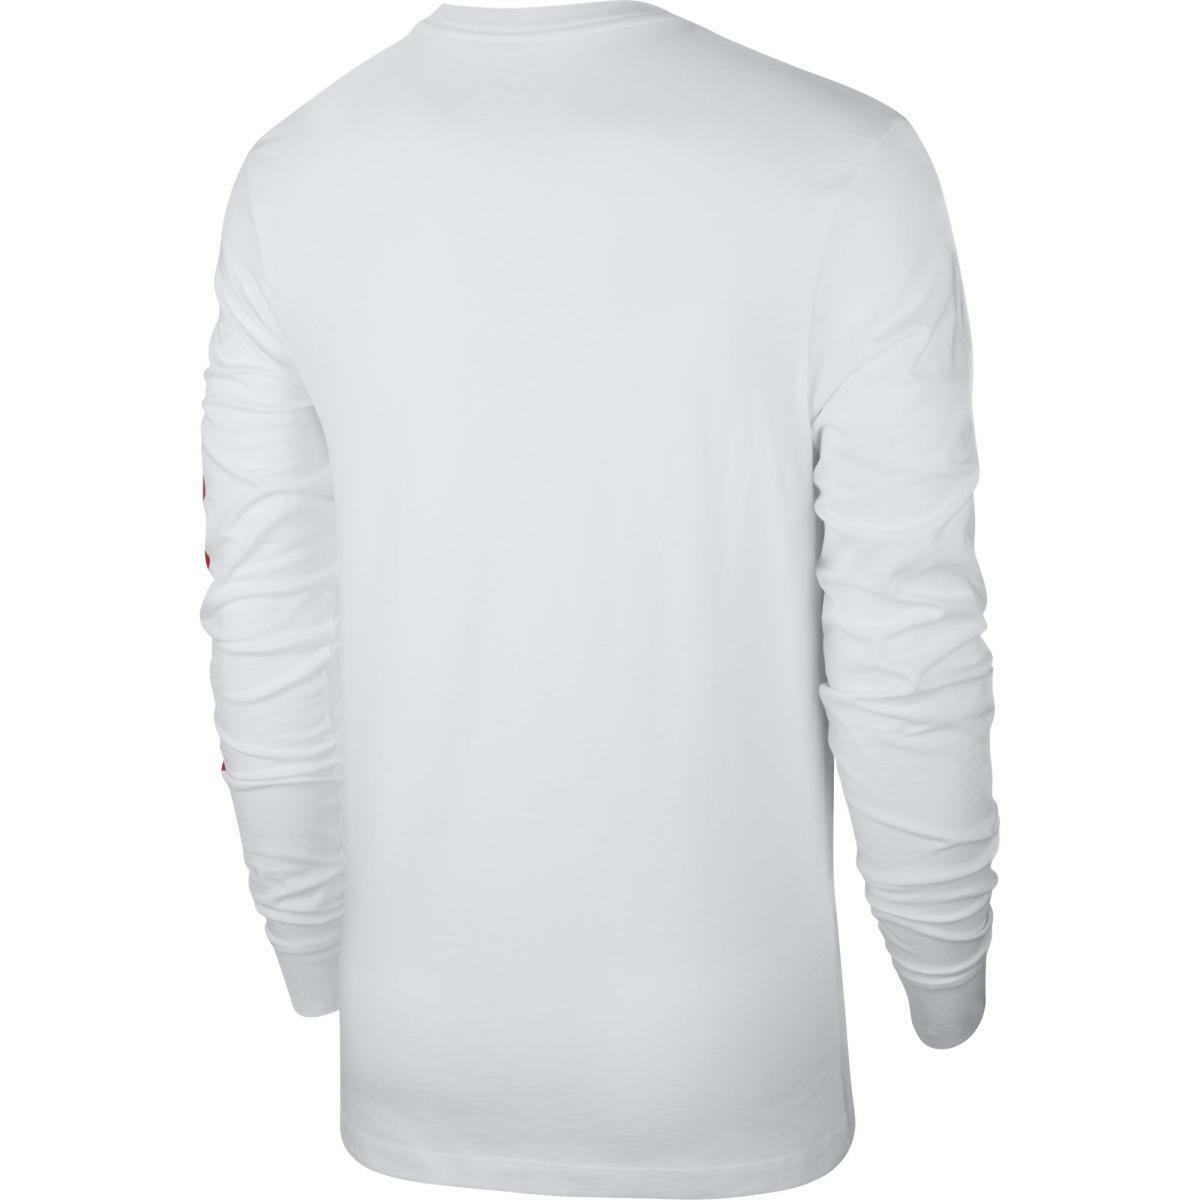 nike t-shirt uomo nike cd9598 100 bianco